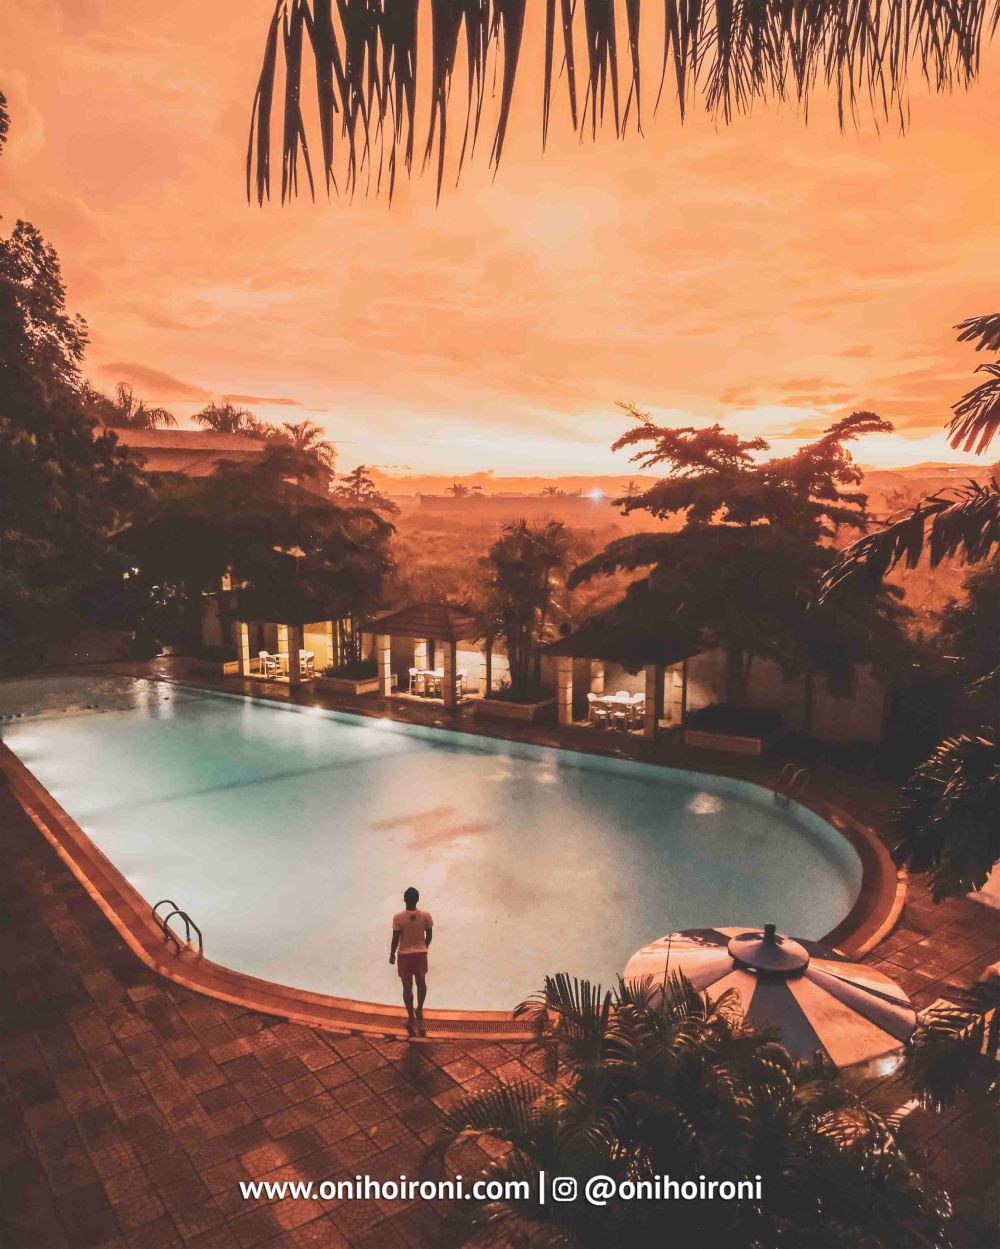 12 Swimming Pool M One Hotel Sentul Bogor, Onihoironi